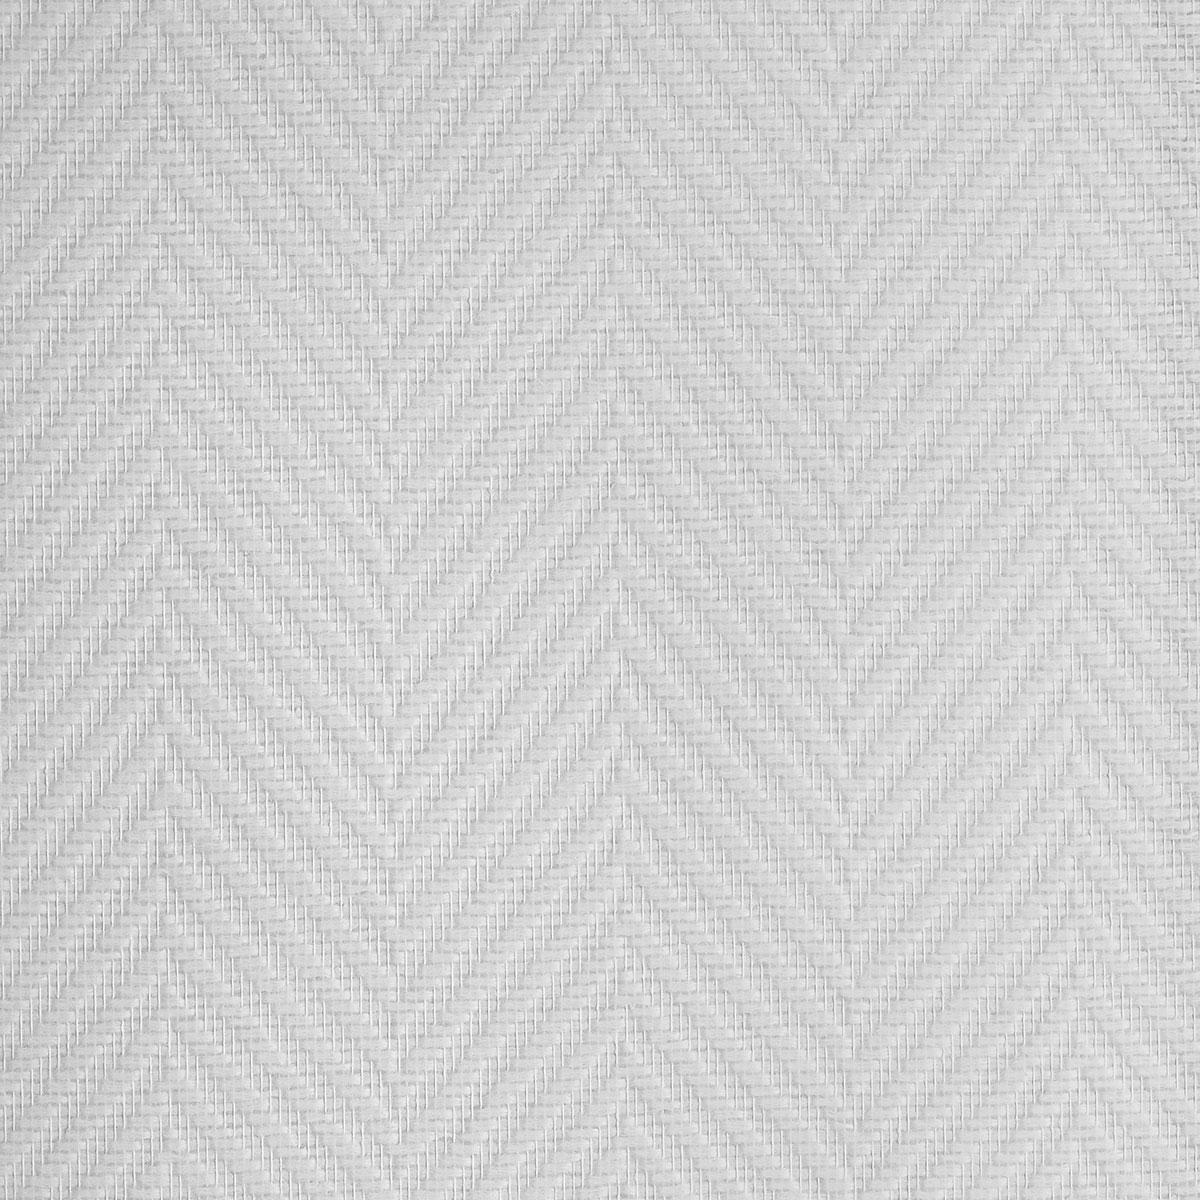 Стеклообои Елка крупная Wellton Optima  1 х 25 м WO470